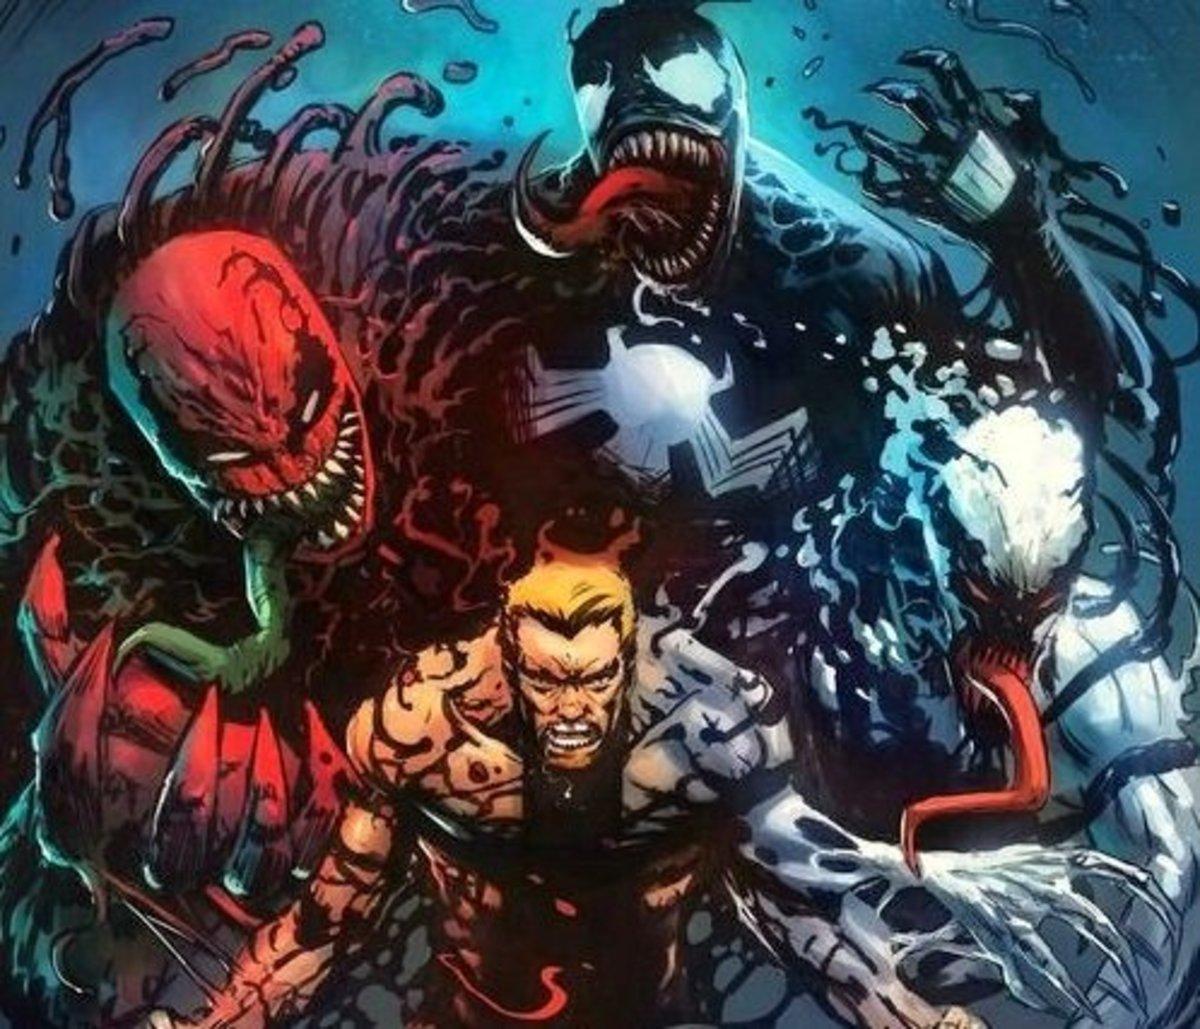 Toxin, Venom, and Anti-Venom